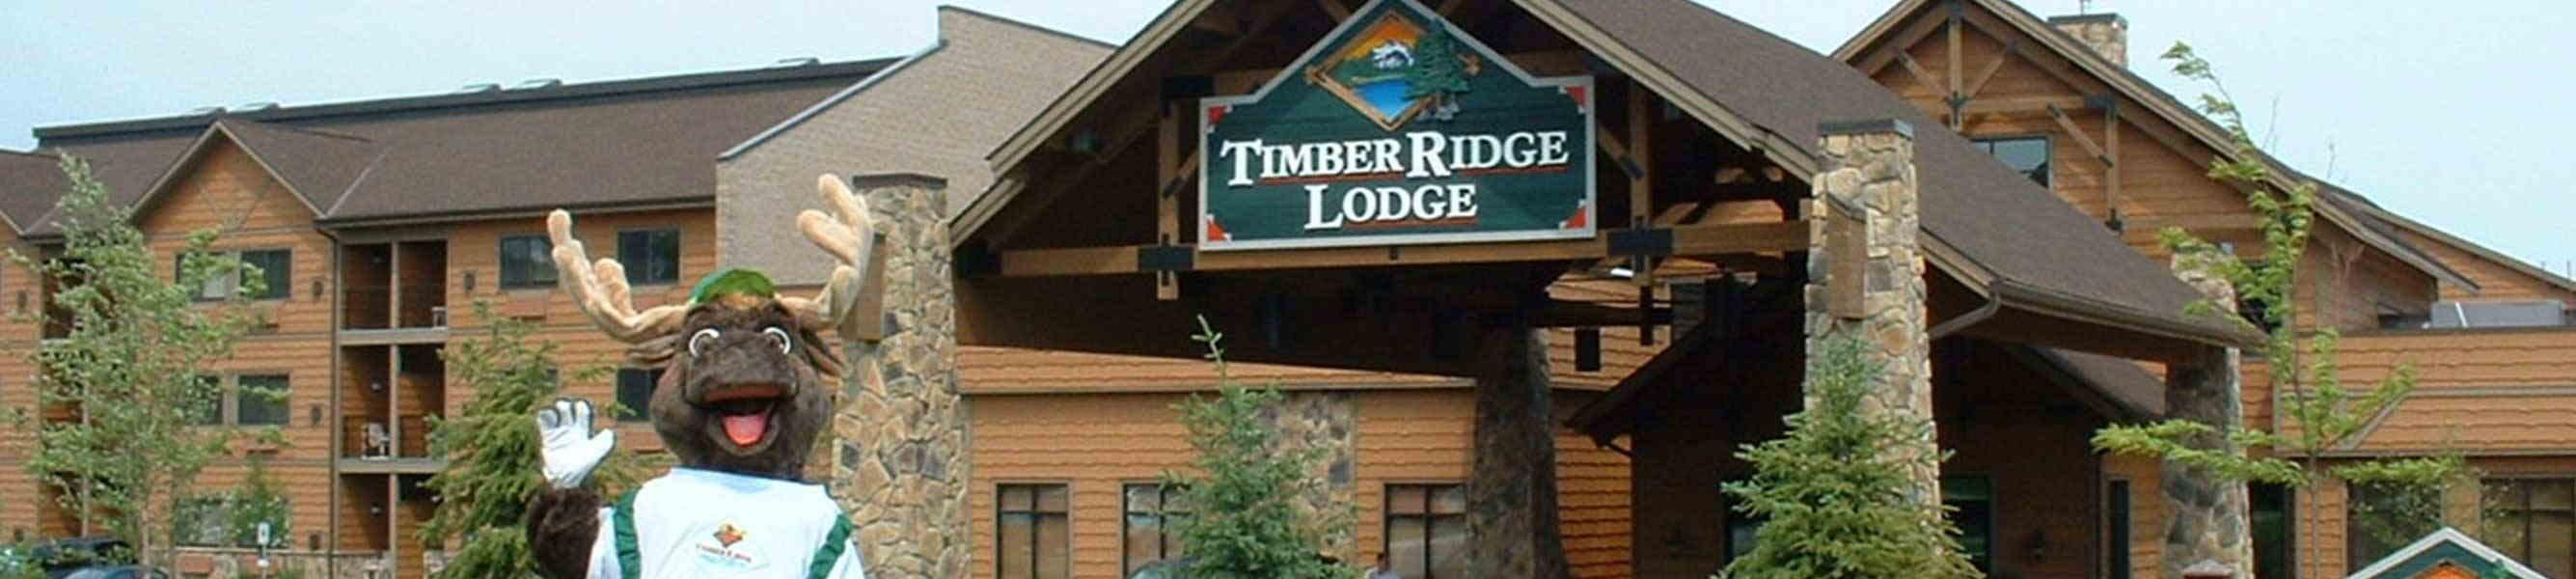 Timber Ridge Mascots